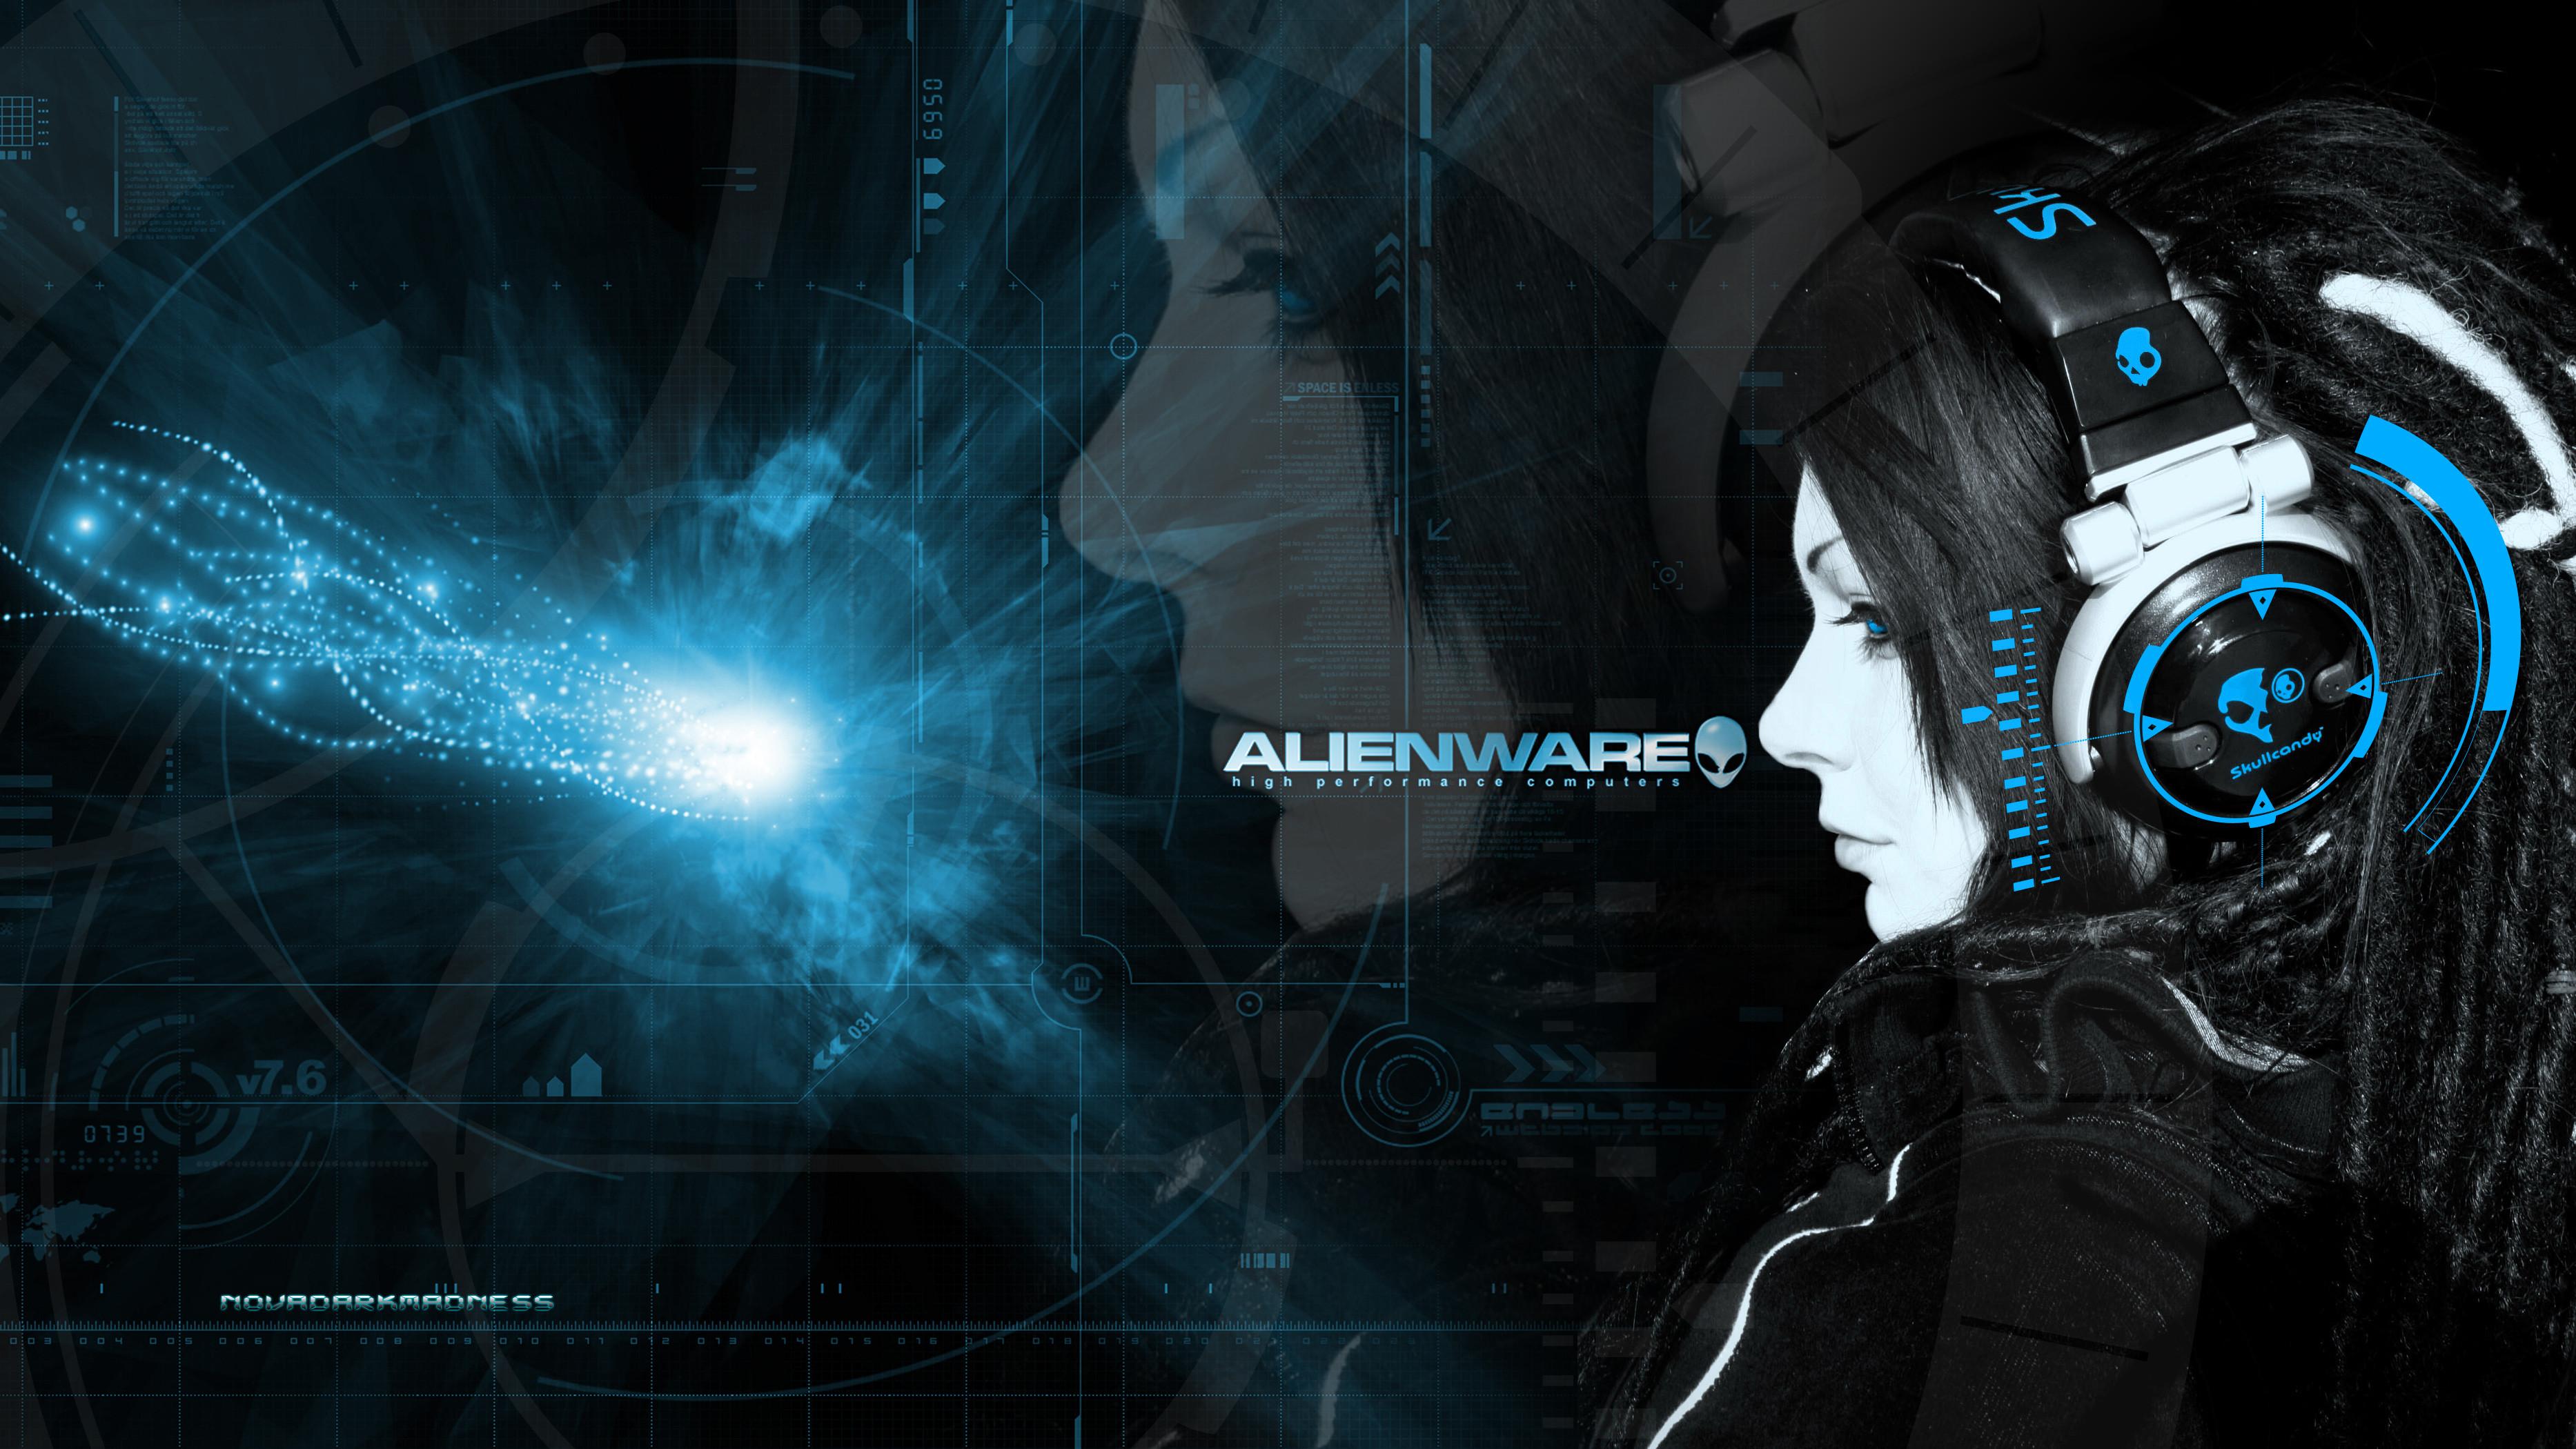 Alienware + Skull Candy Headphones Girl Wallpaper by NovaDarkMadness .